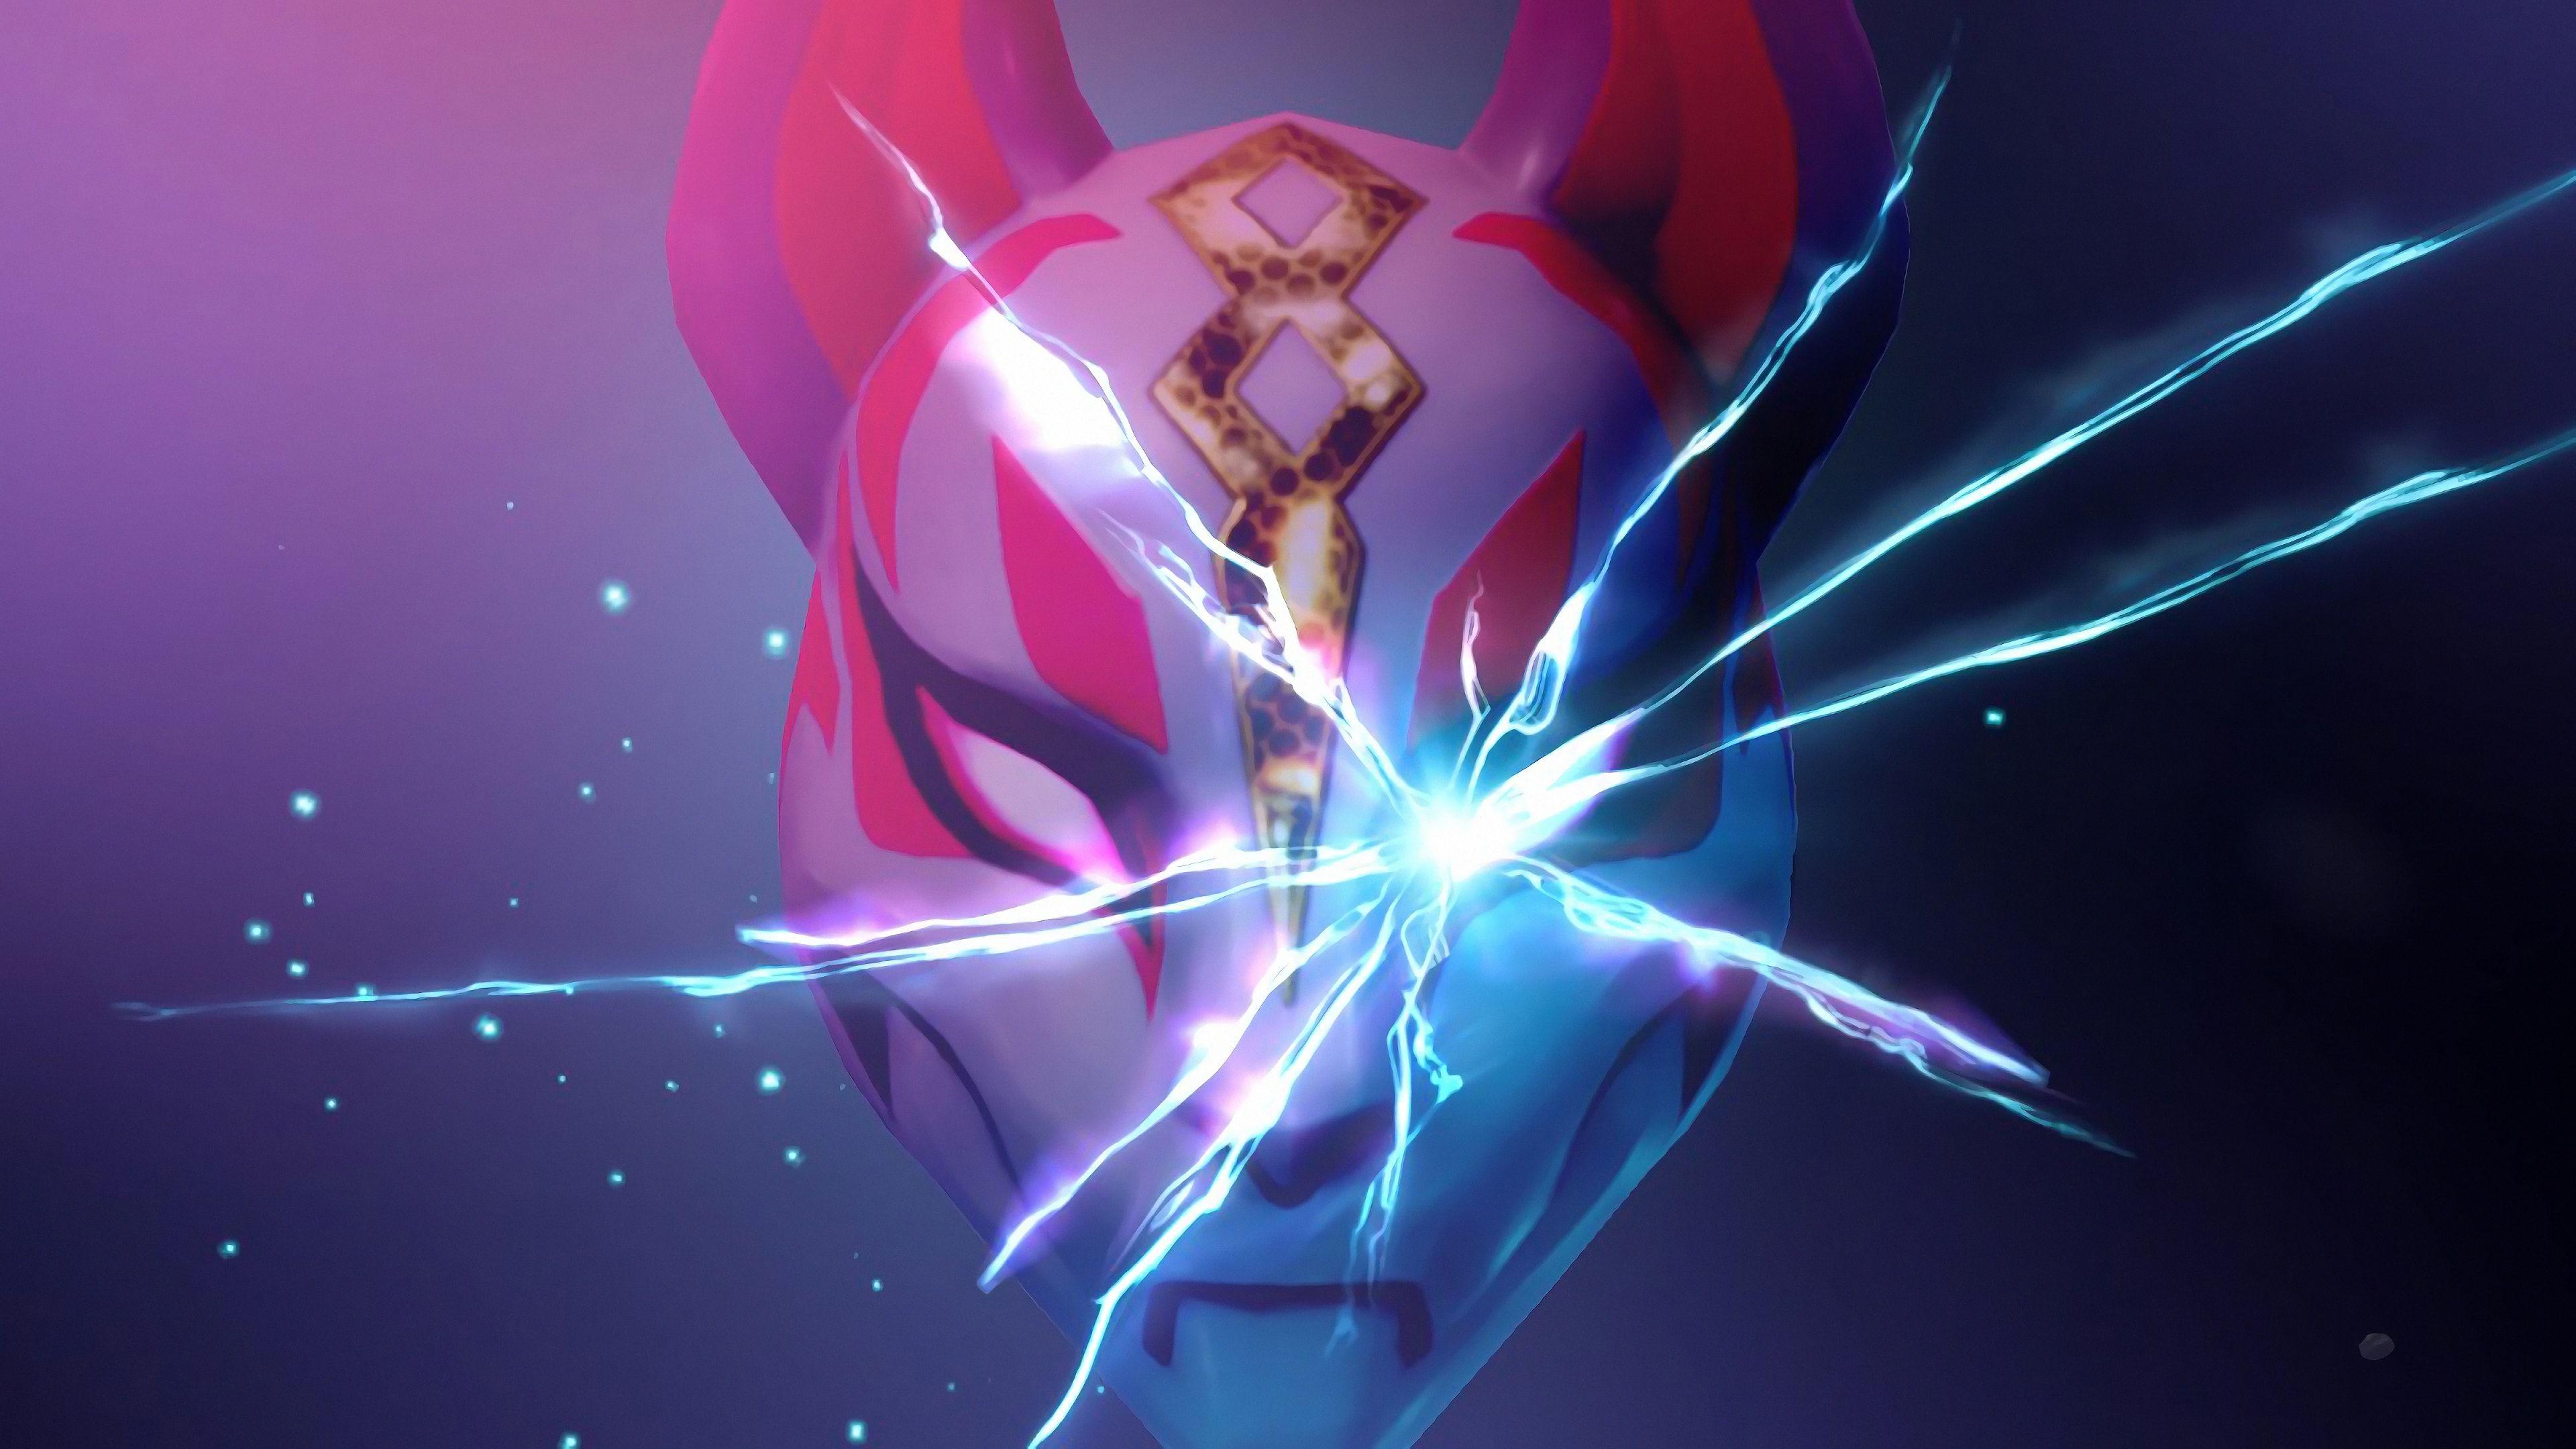 Free download Kitsune Mask Drift Fortnite Battle Royale